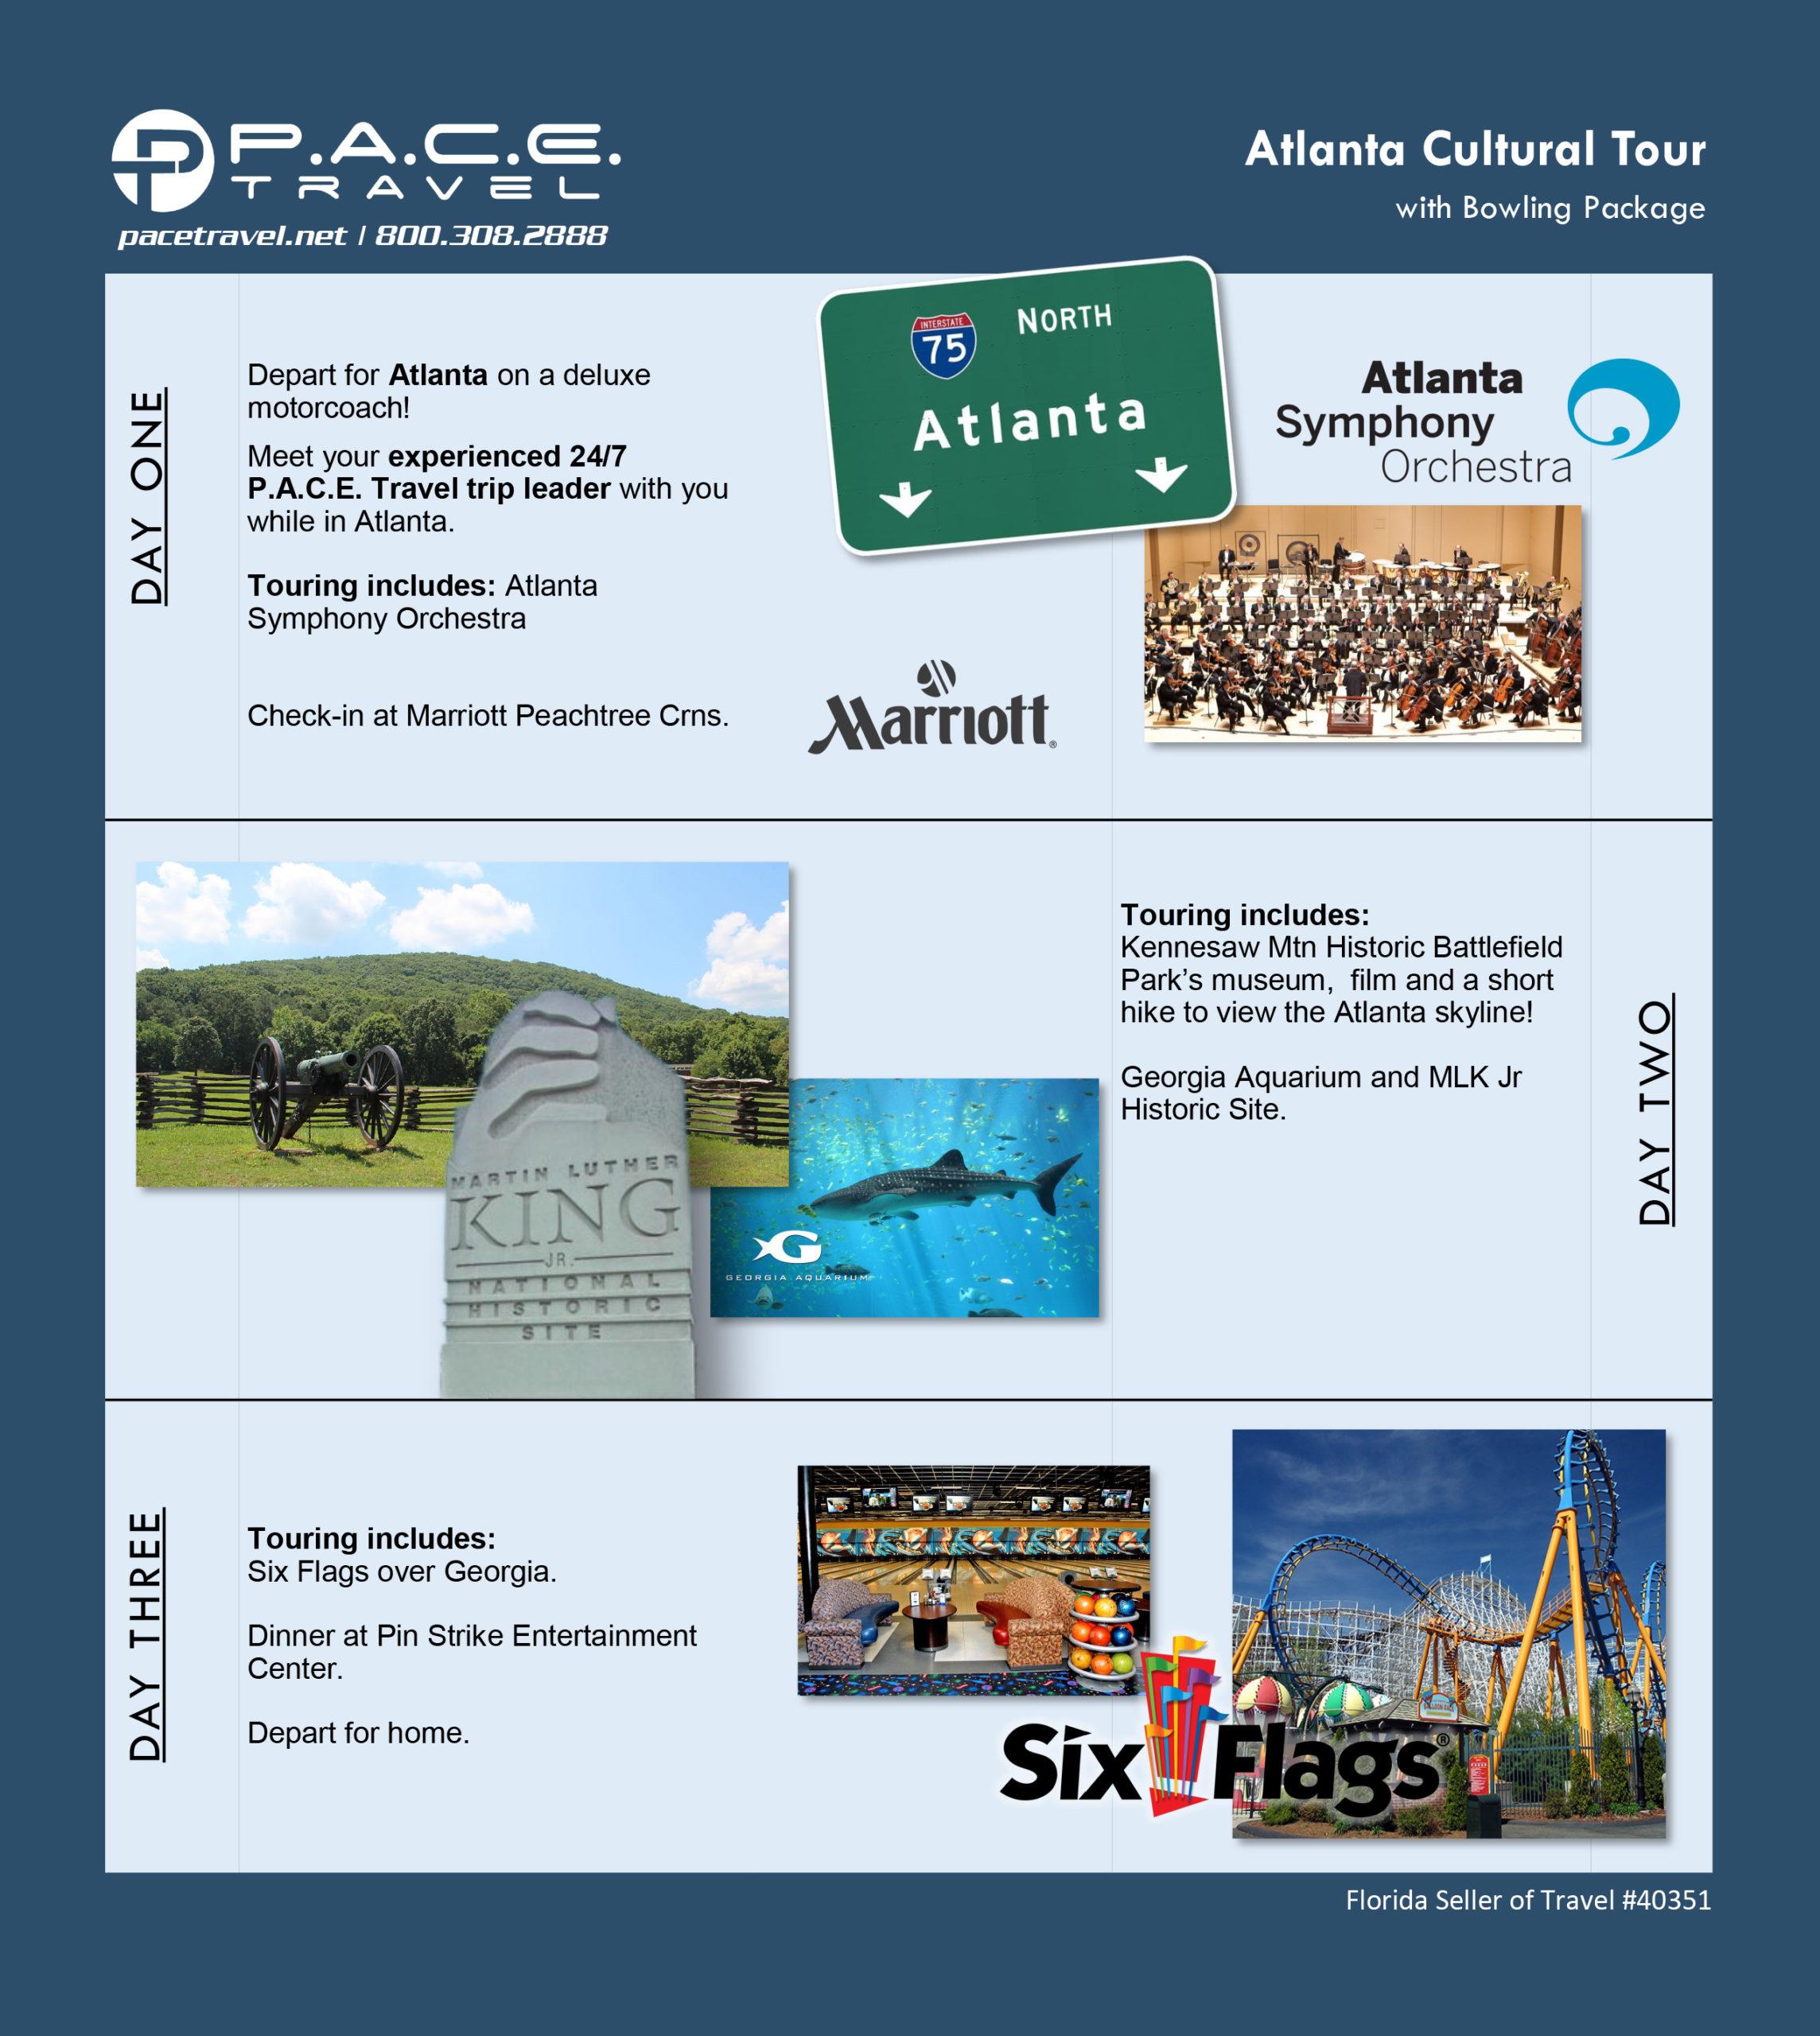 Atlanta 2021 Trip Package - Pace Travel